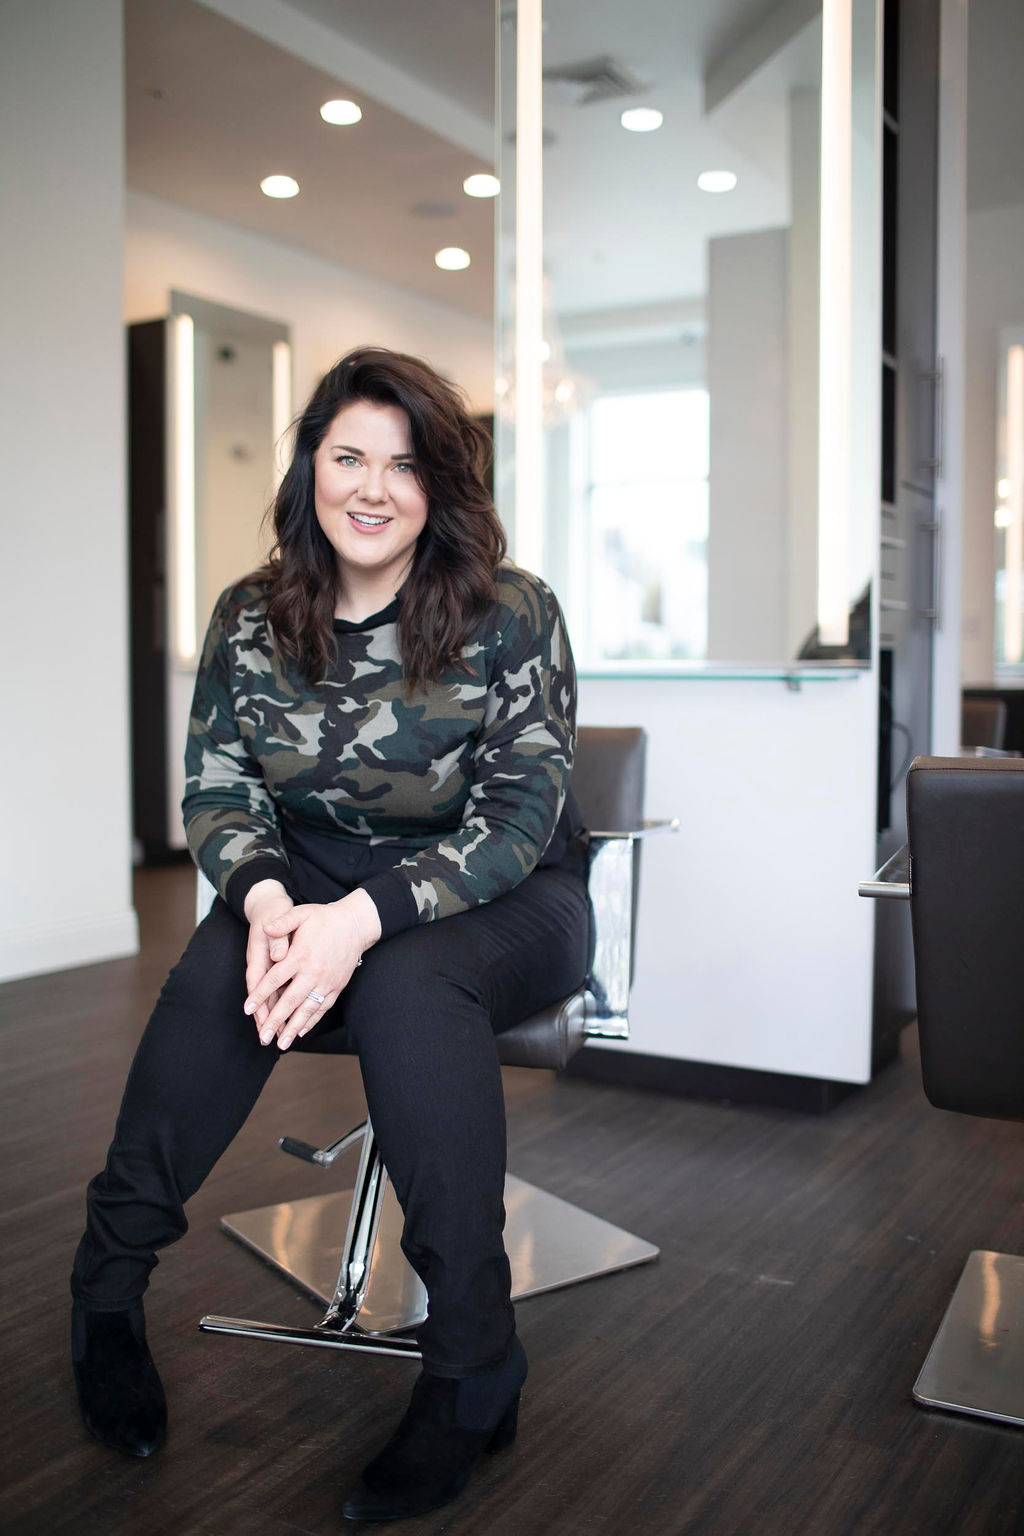 Salon Leadership Series Part 1: Leaders Are Influencers